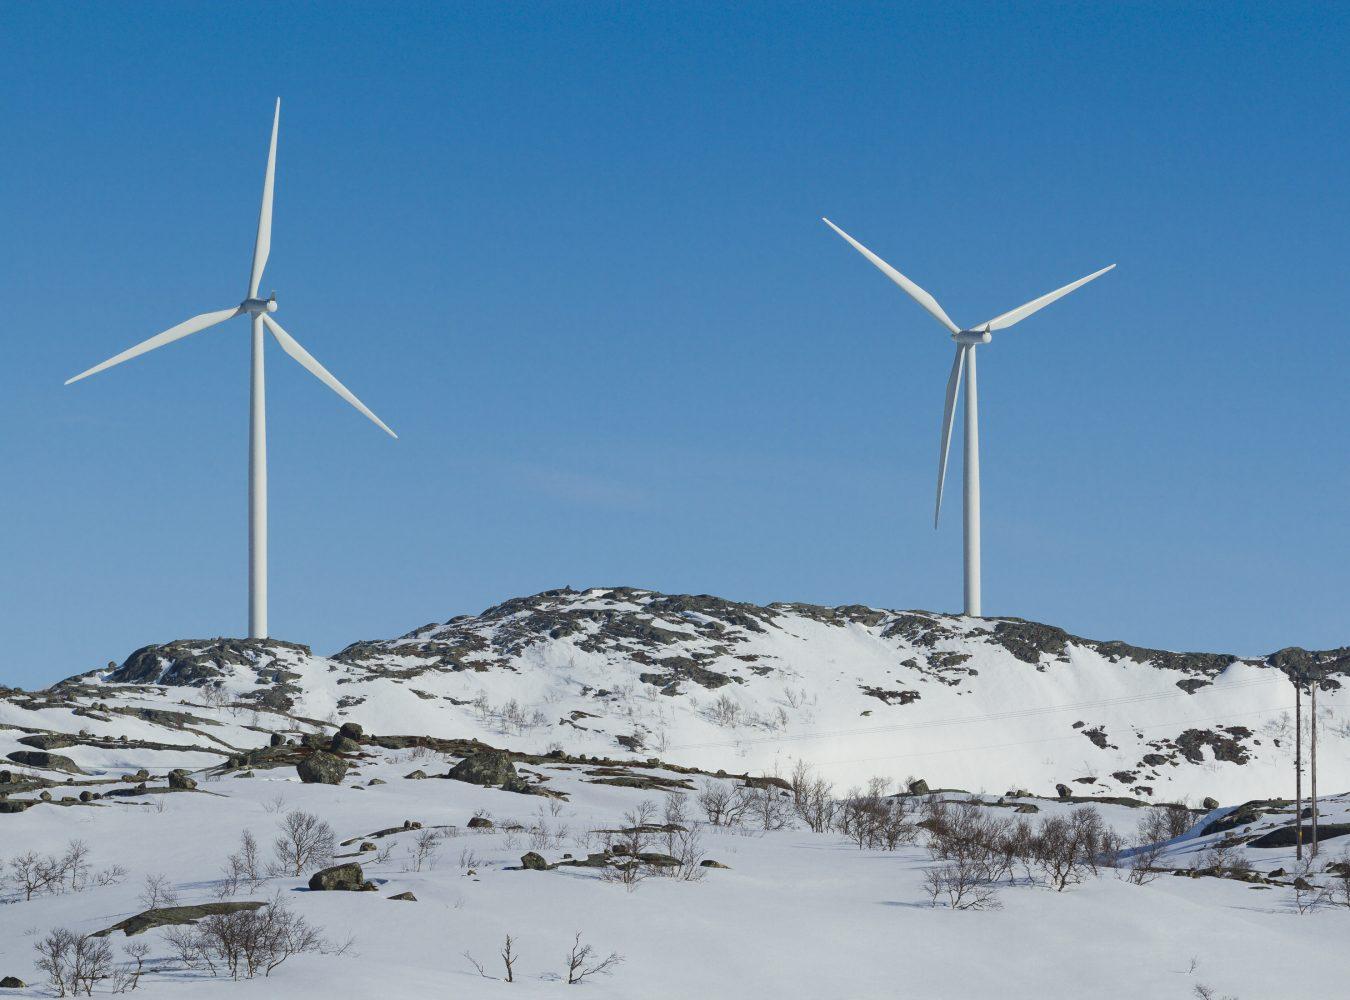 Vindmøller på Nygårdsfjellet i Nordland. Foto: